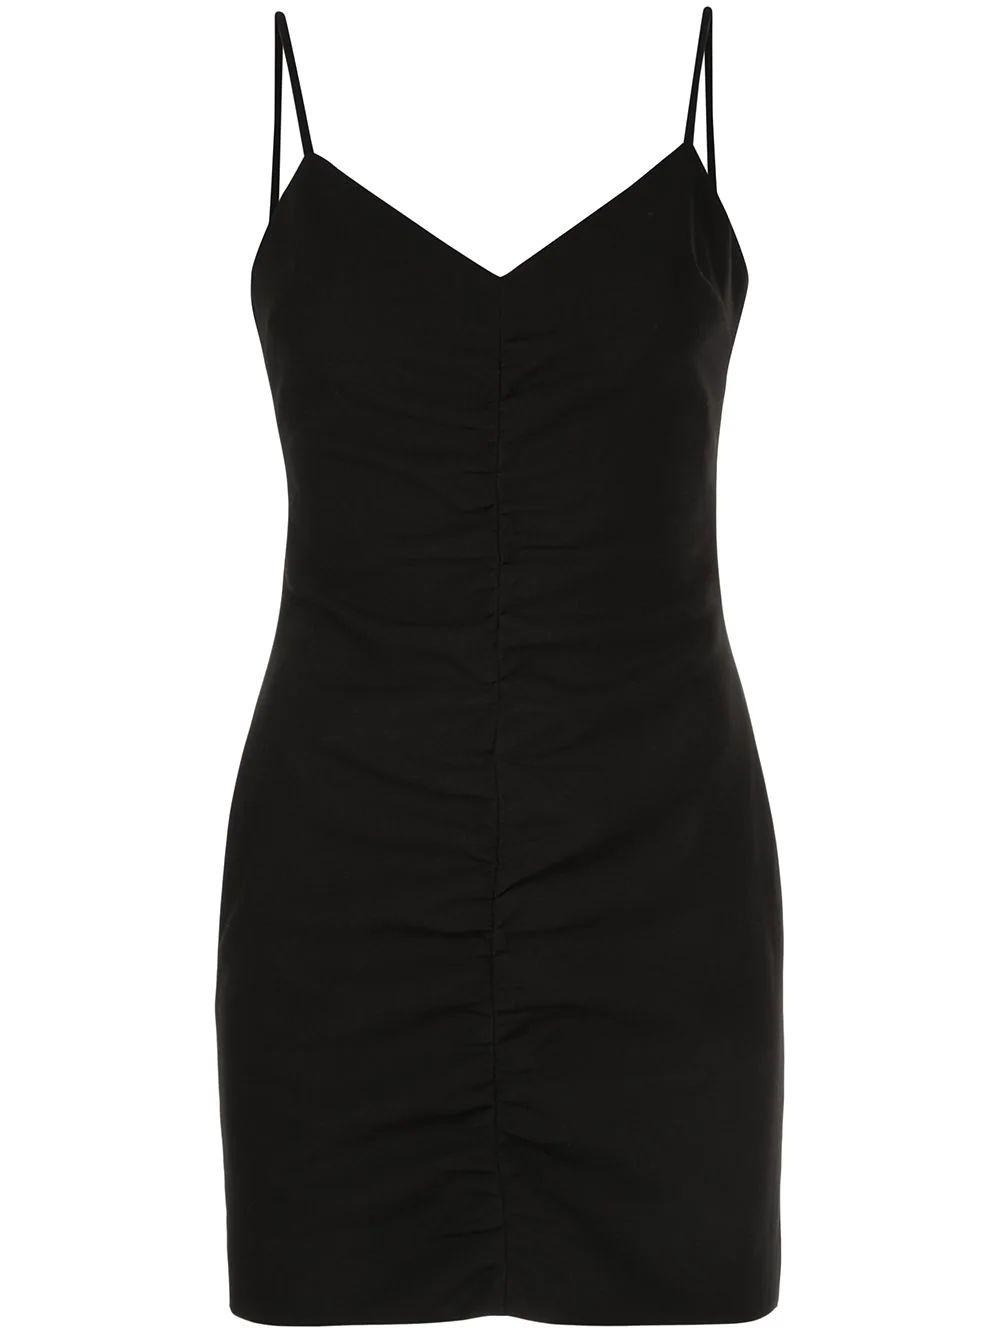 Charla Ruched Mini Dress Item # YD1130001LYB